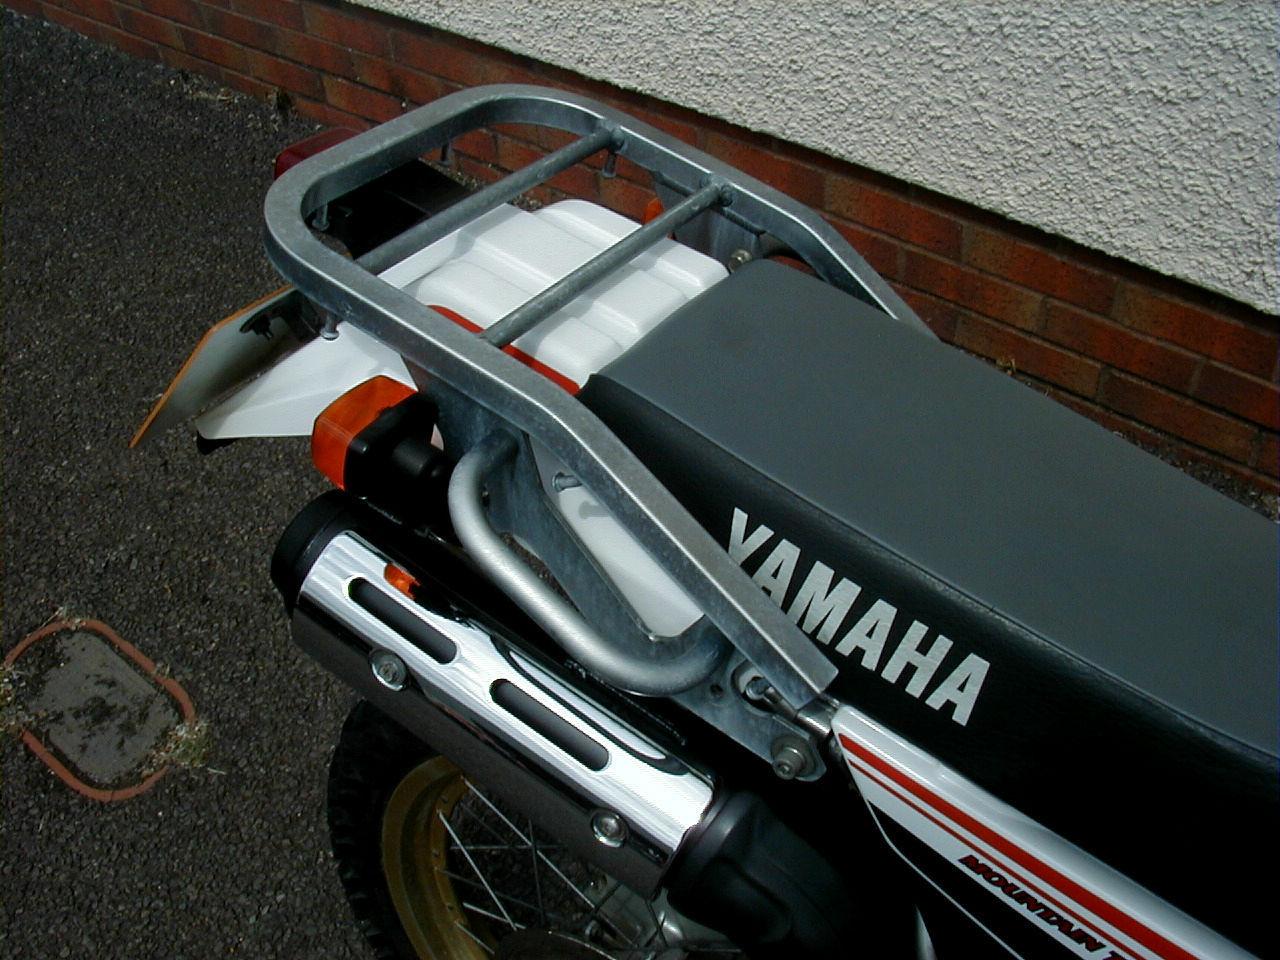 2011 yamaha stryker service manual